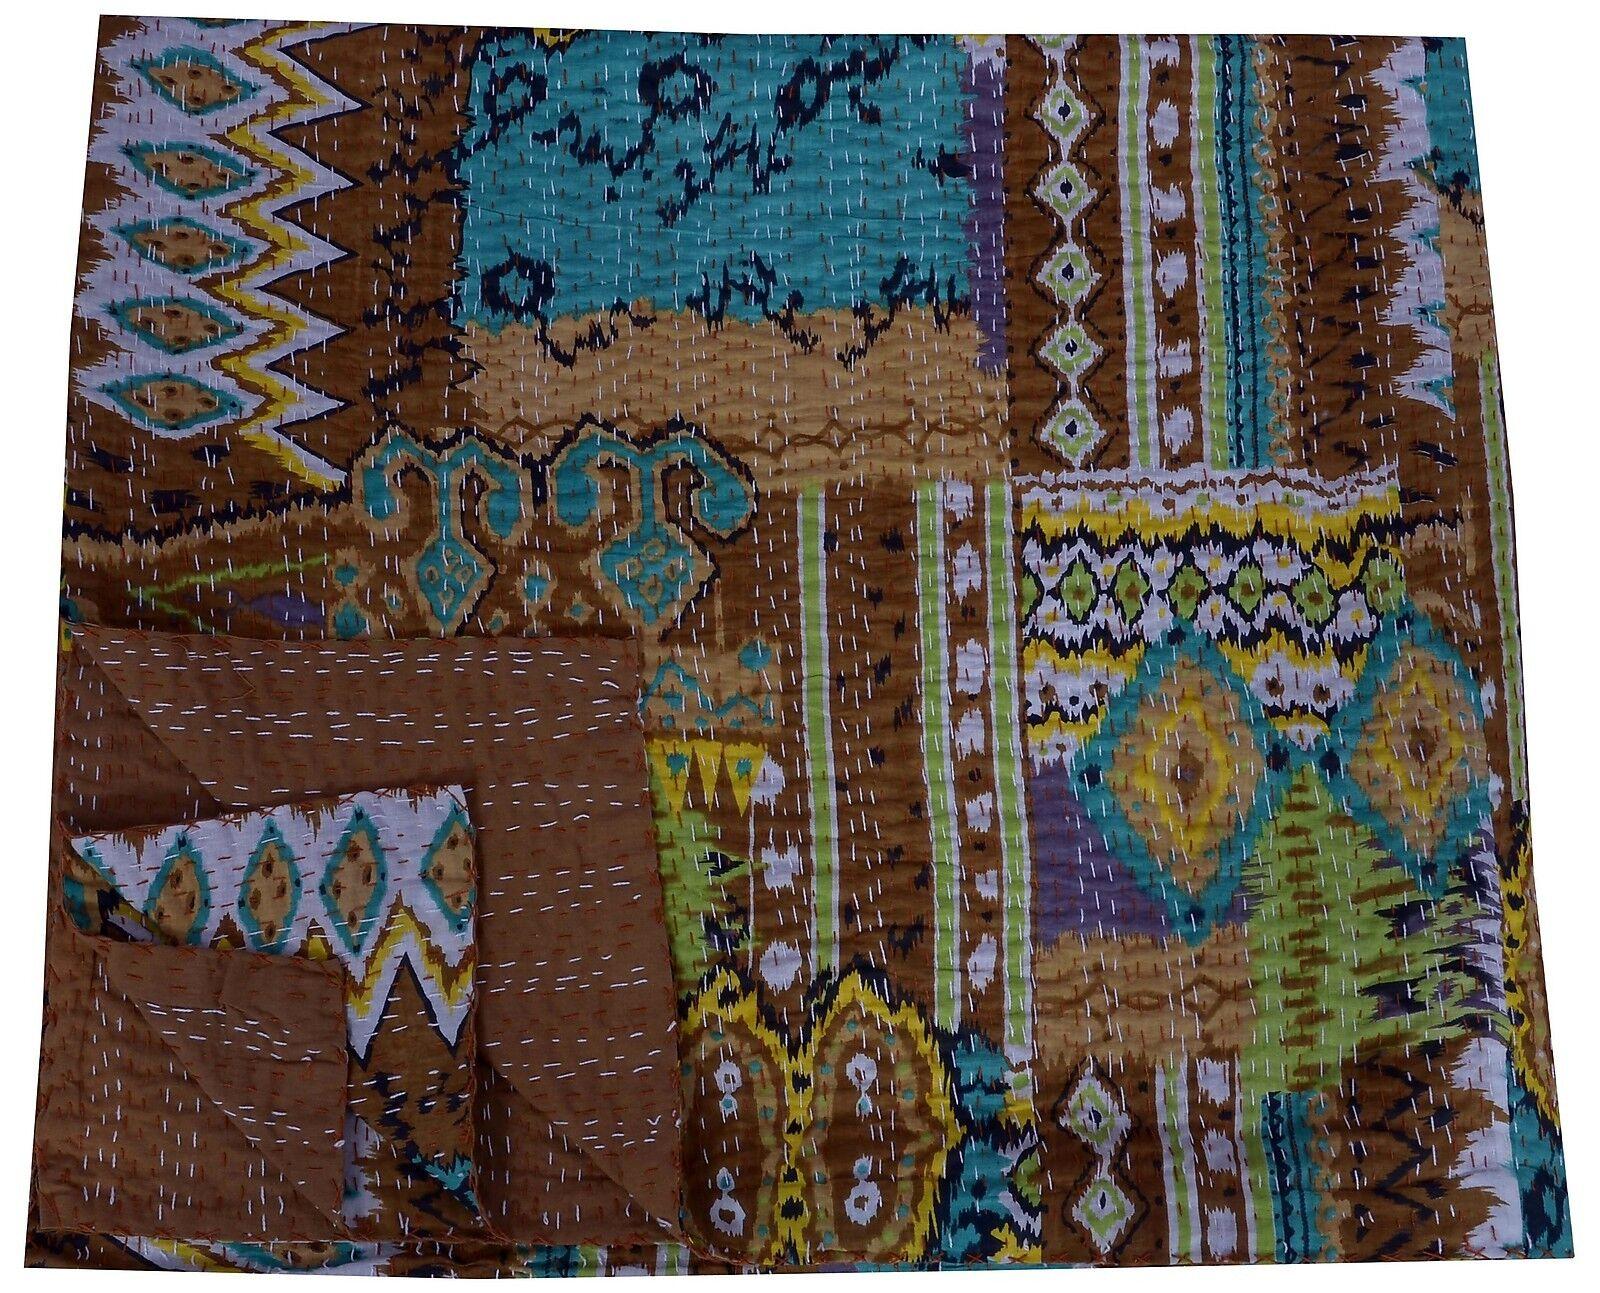 braun Ikat Cotton Reversible Queen Größe Kantha Quilt Bedspread Blanket Handmade